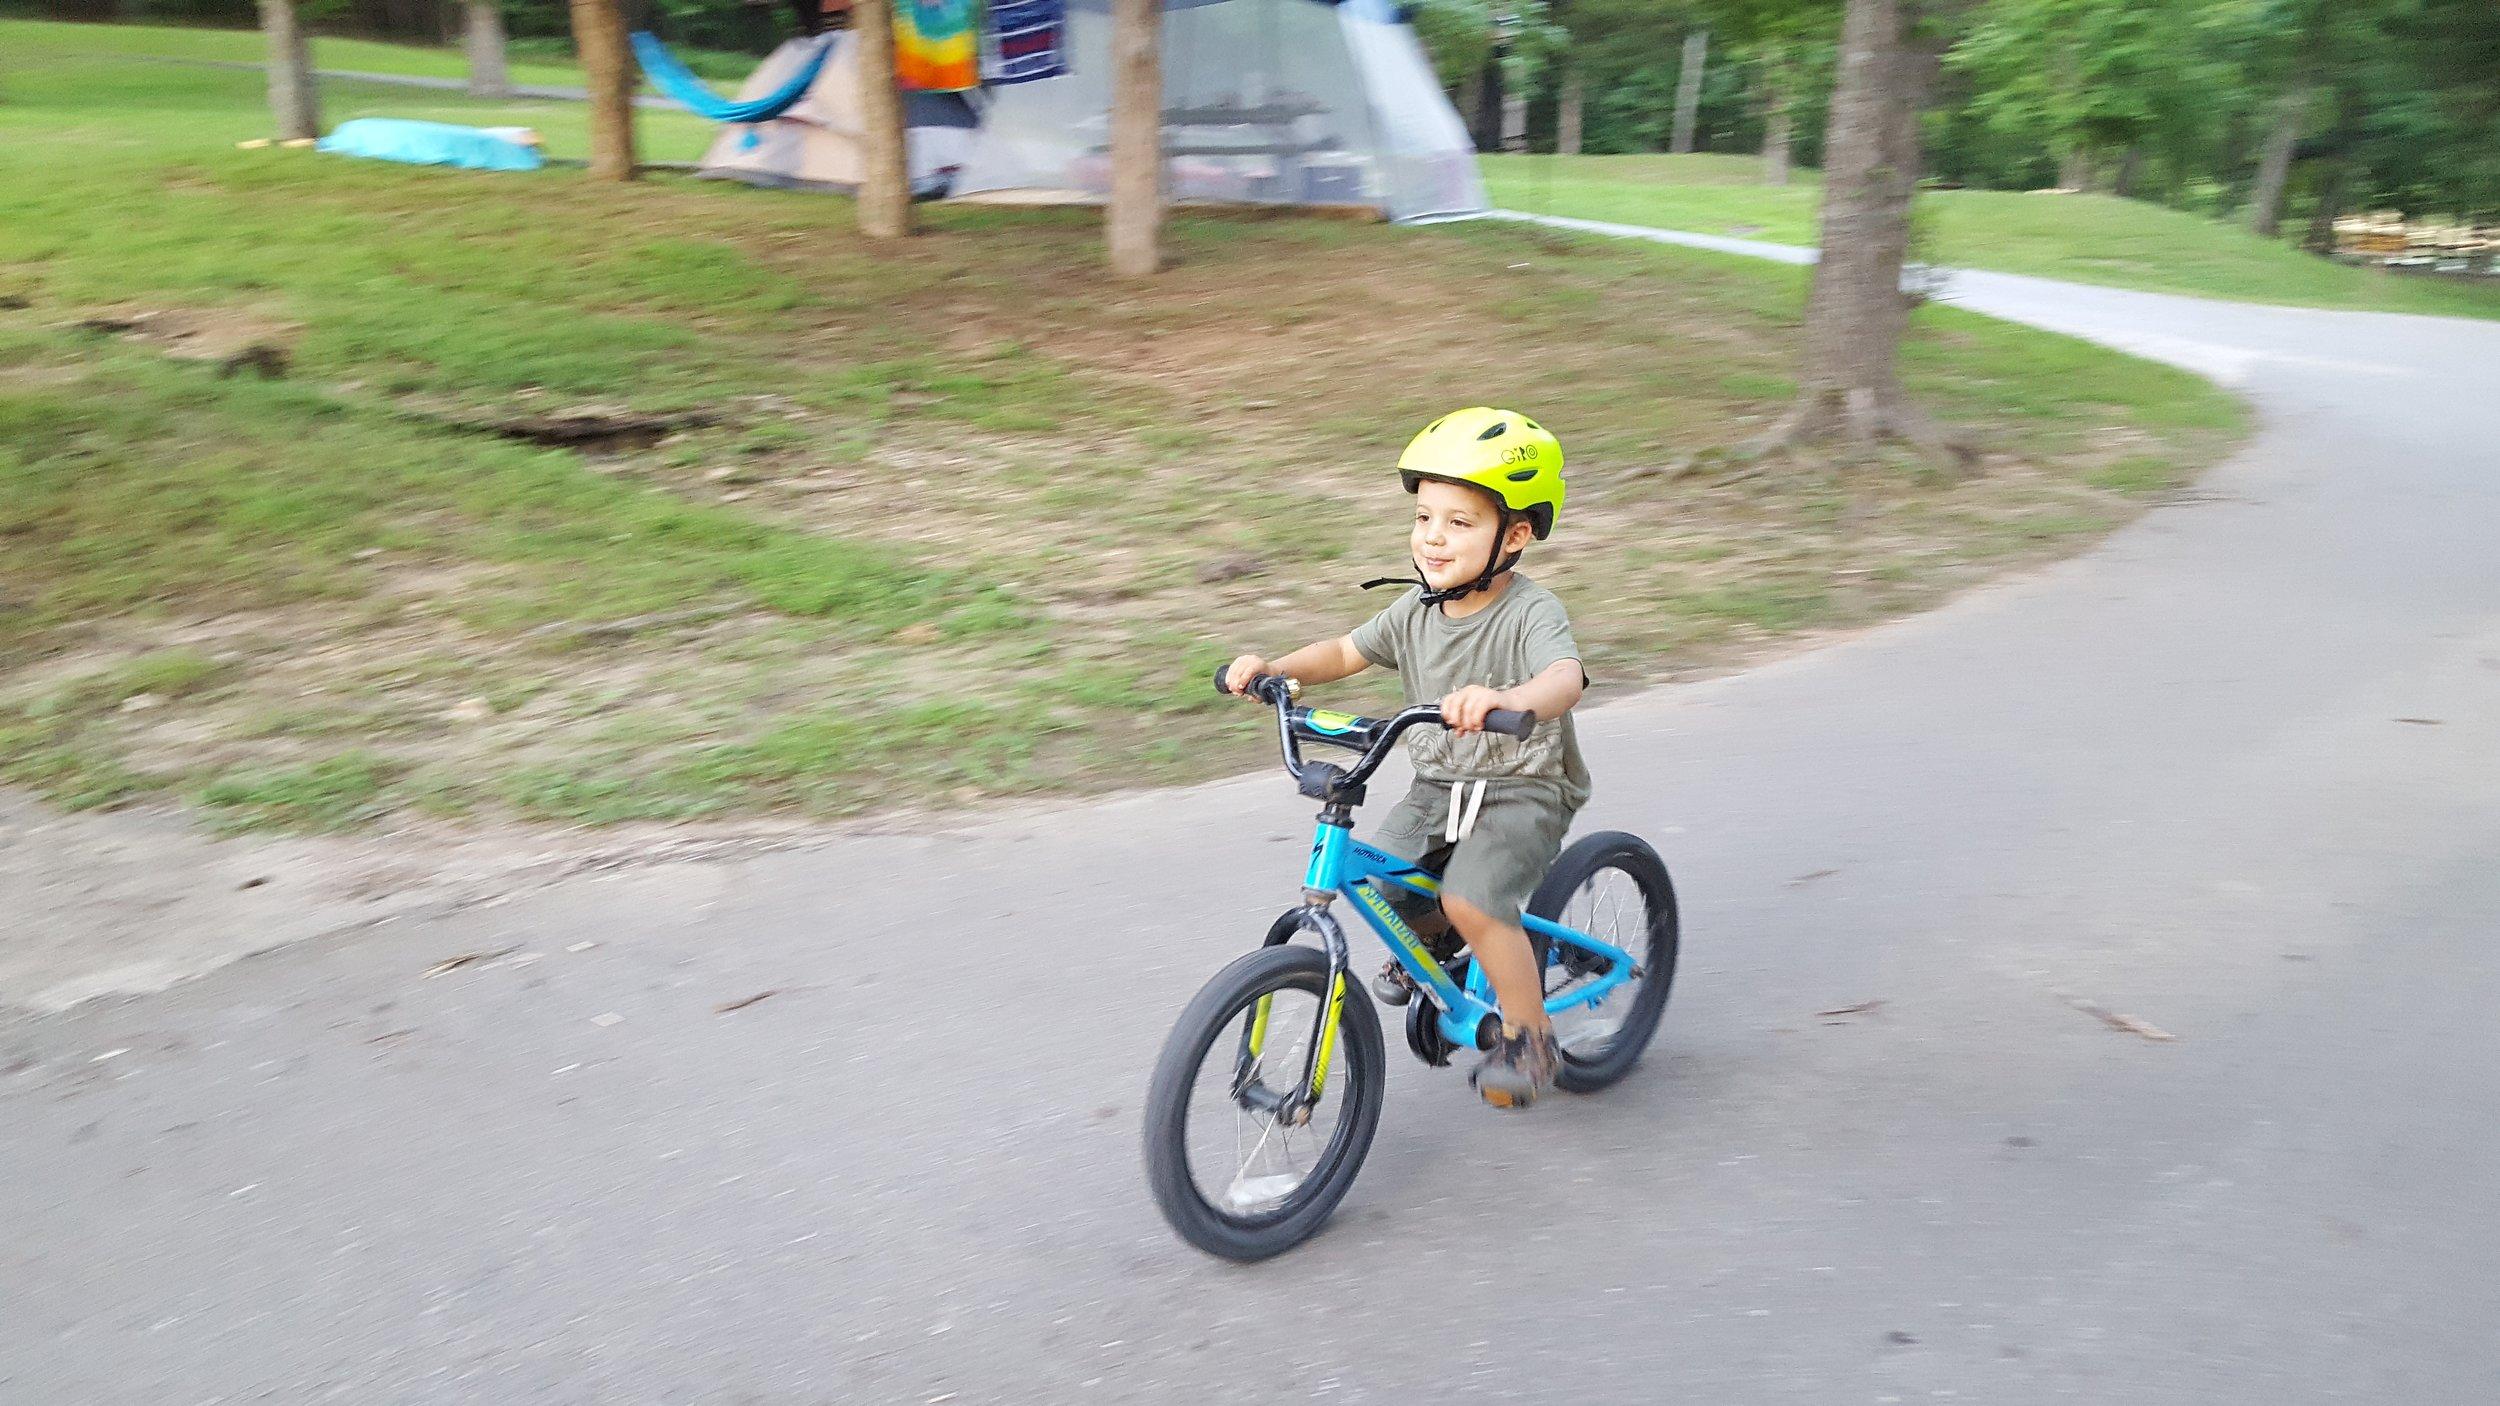 Bike rides around the campground!